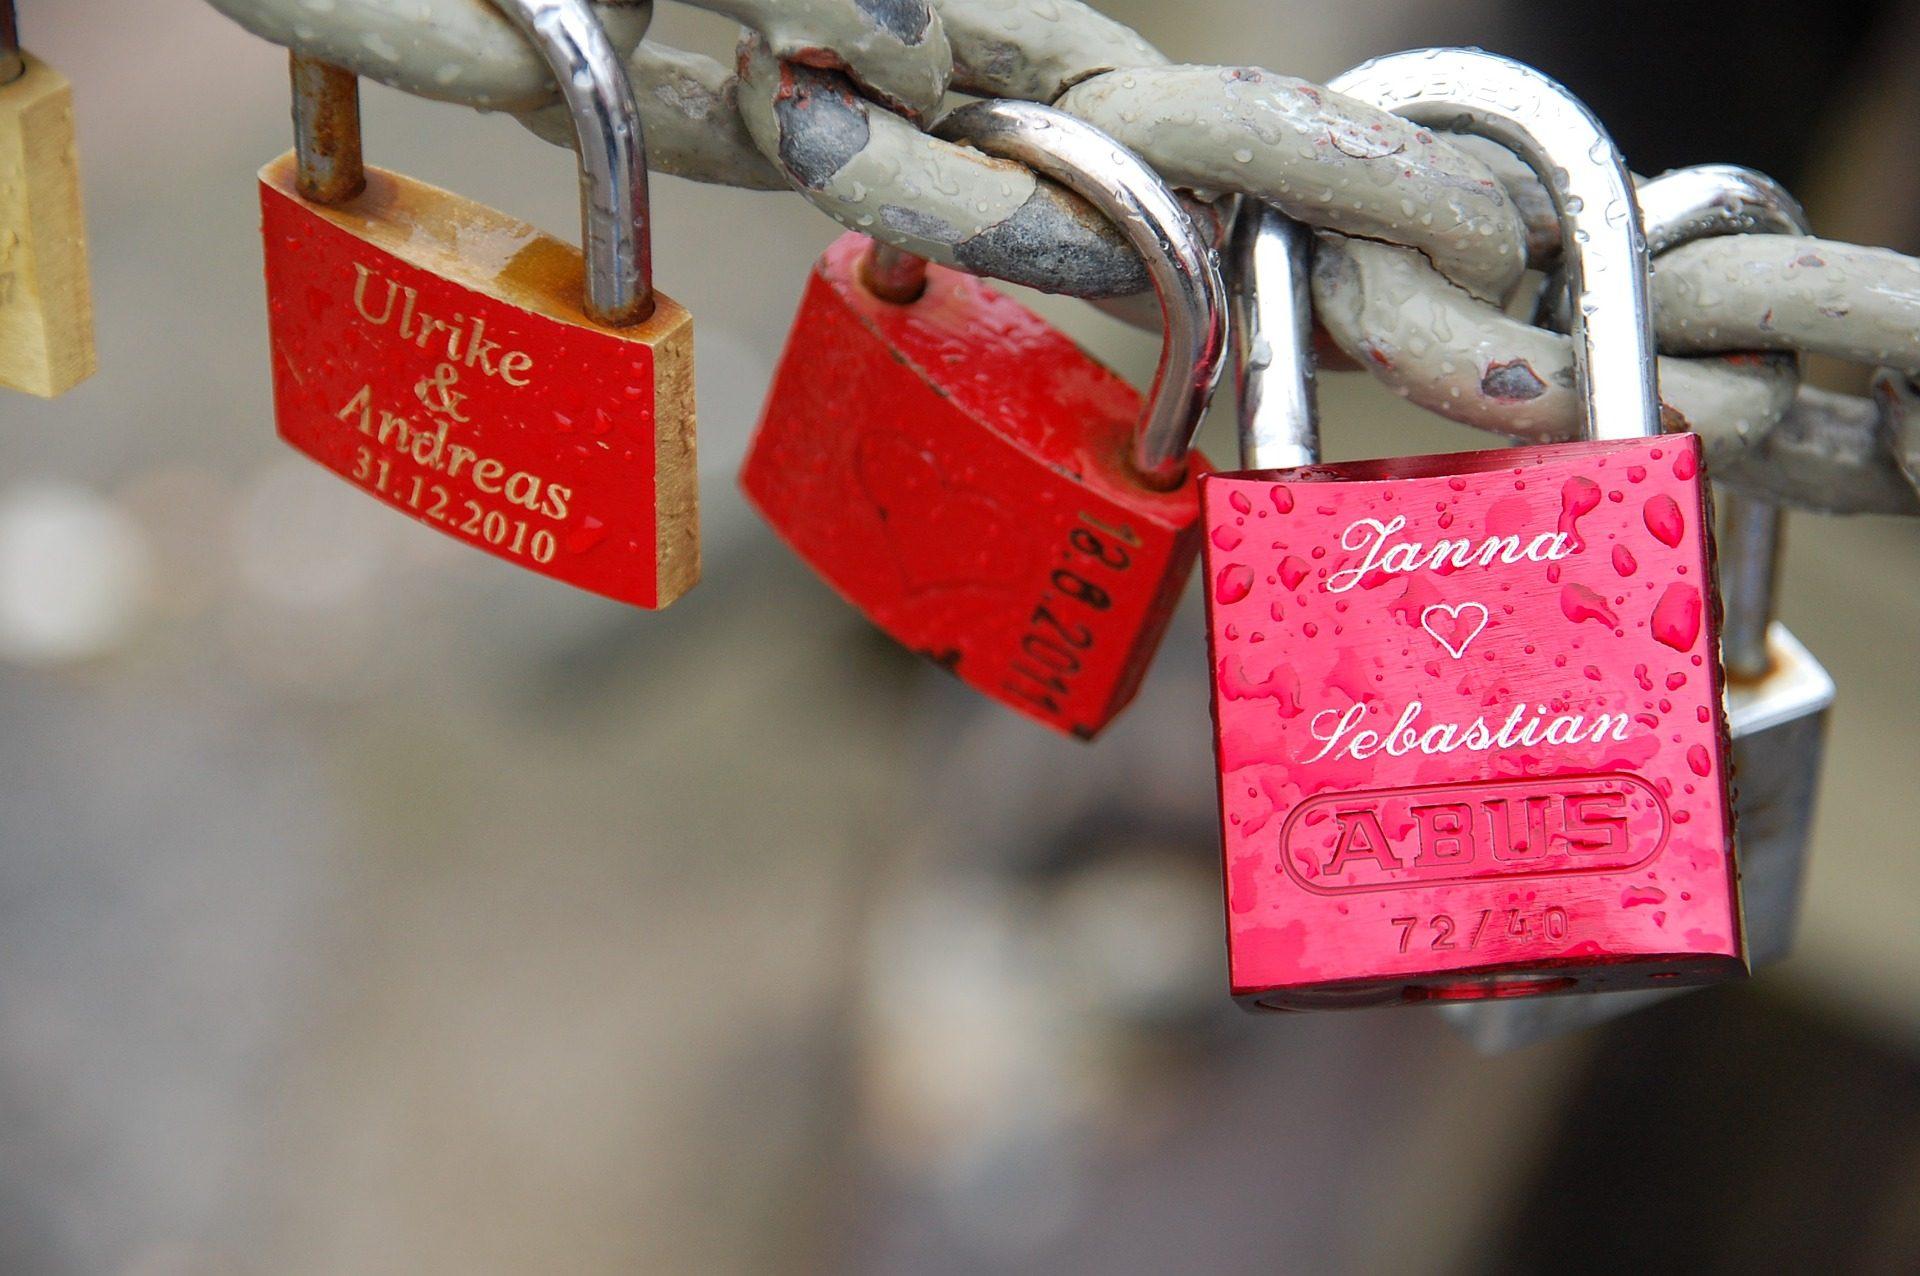 padlocks, प्यार, का वादा किया, शुभकामनाएं, चेन - HD वॉलपेपर - प्रोफेसर-falken.com